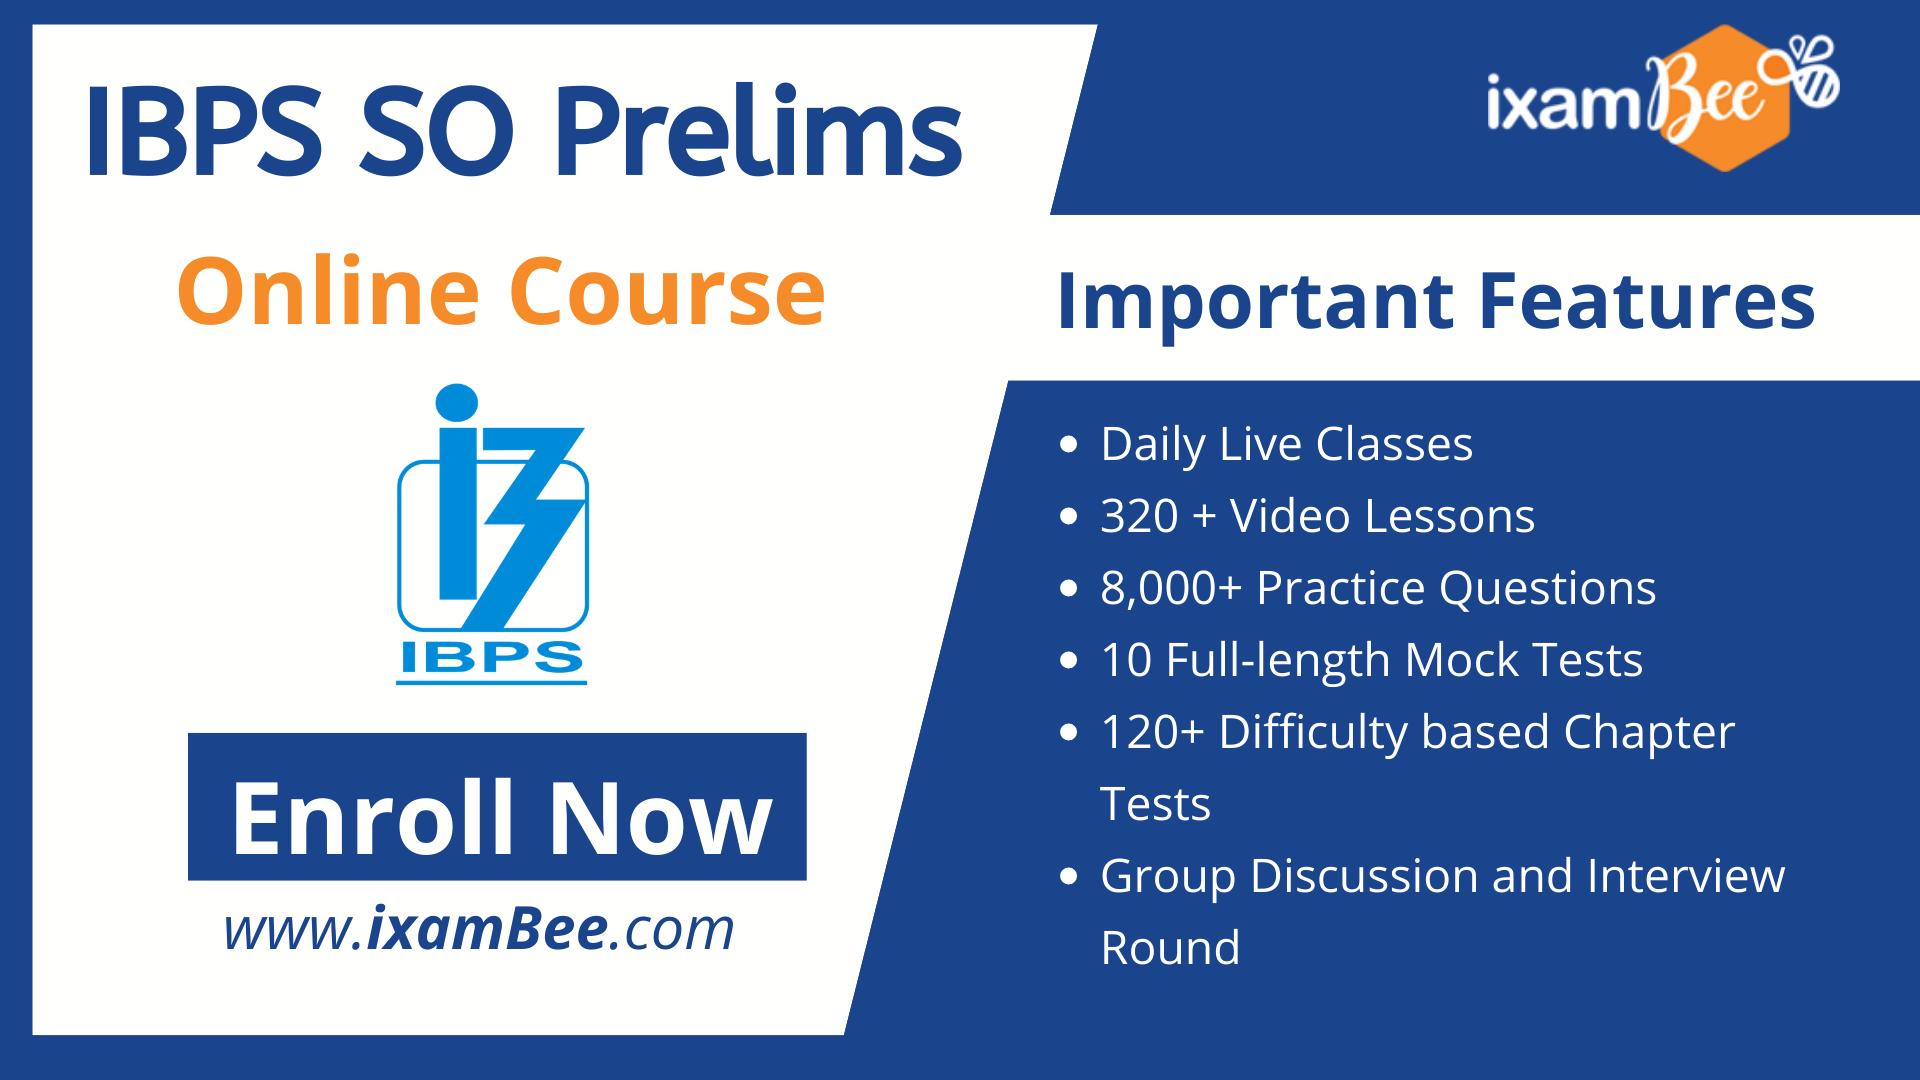 IBPS SO Prelims online course